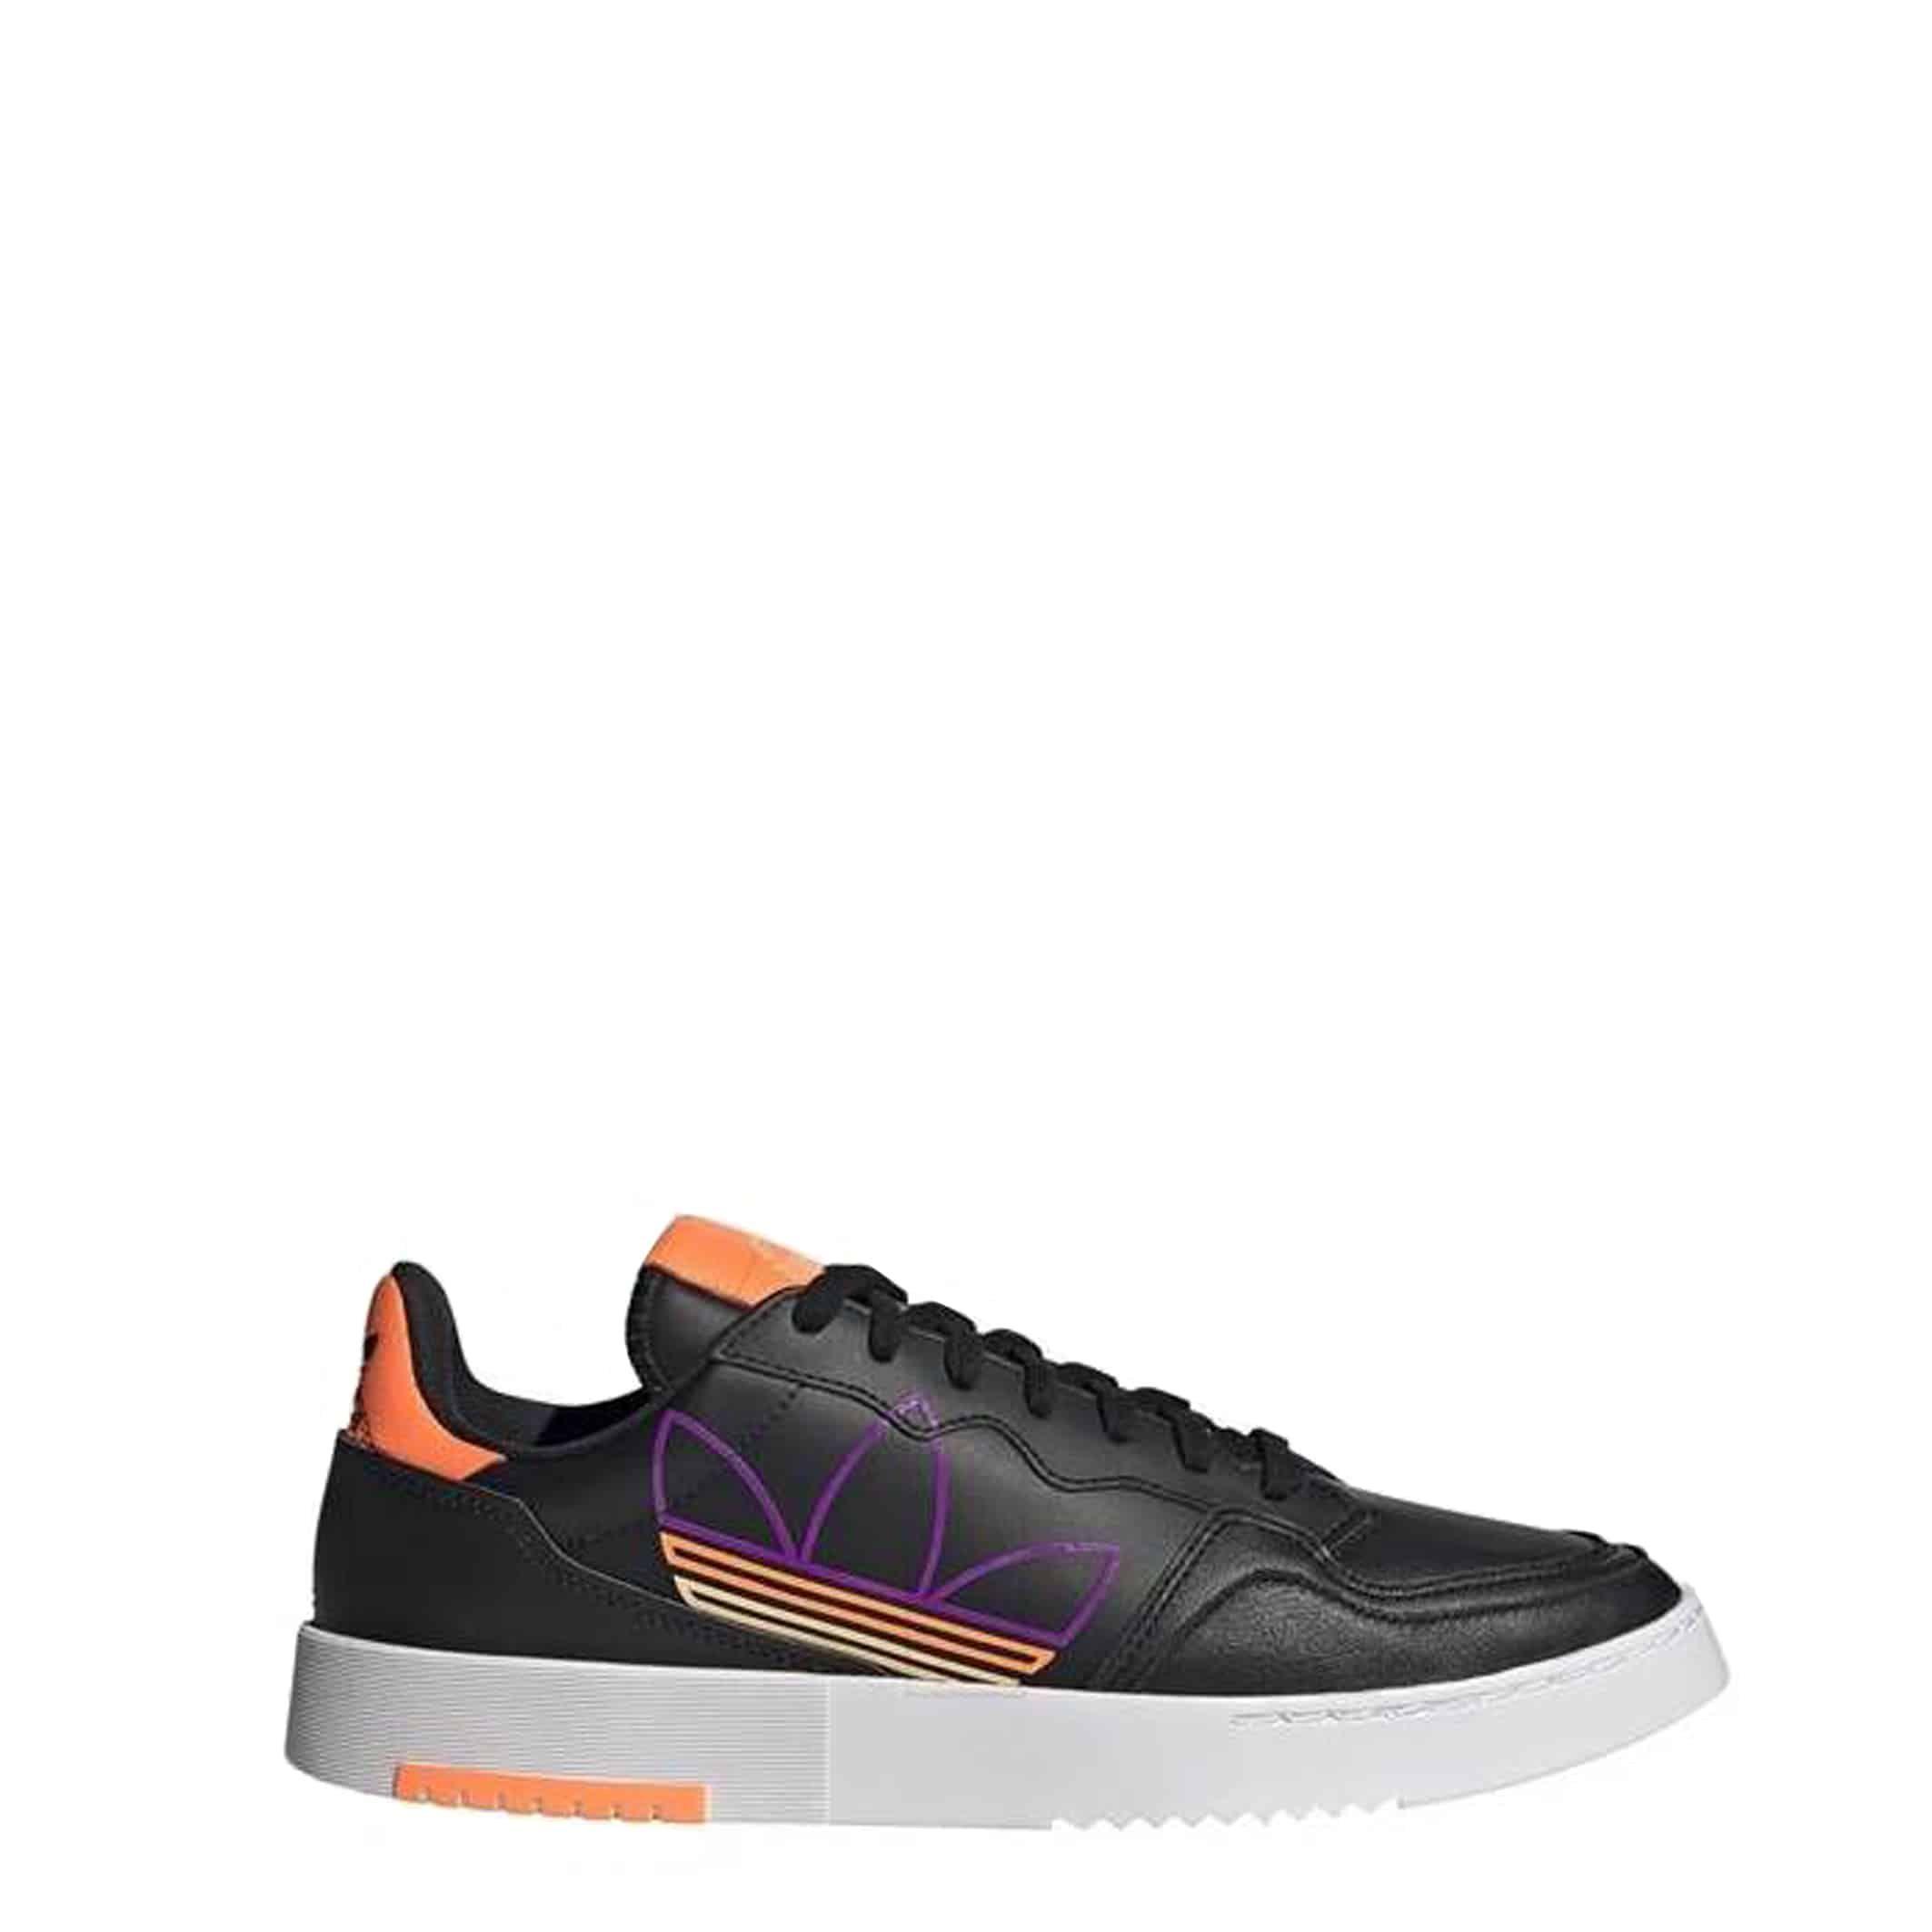 Adidas - Supercourt | You Fashion Outlet